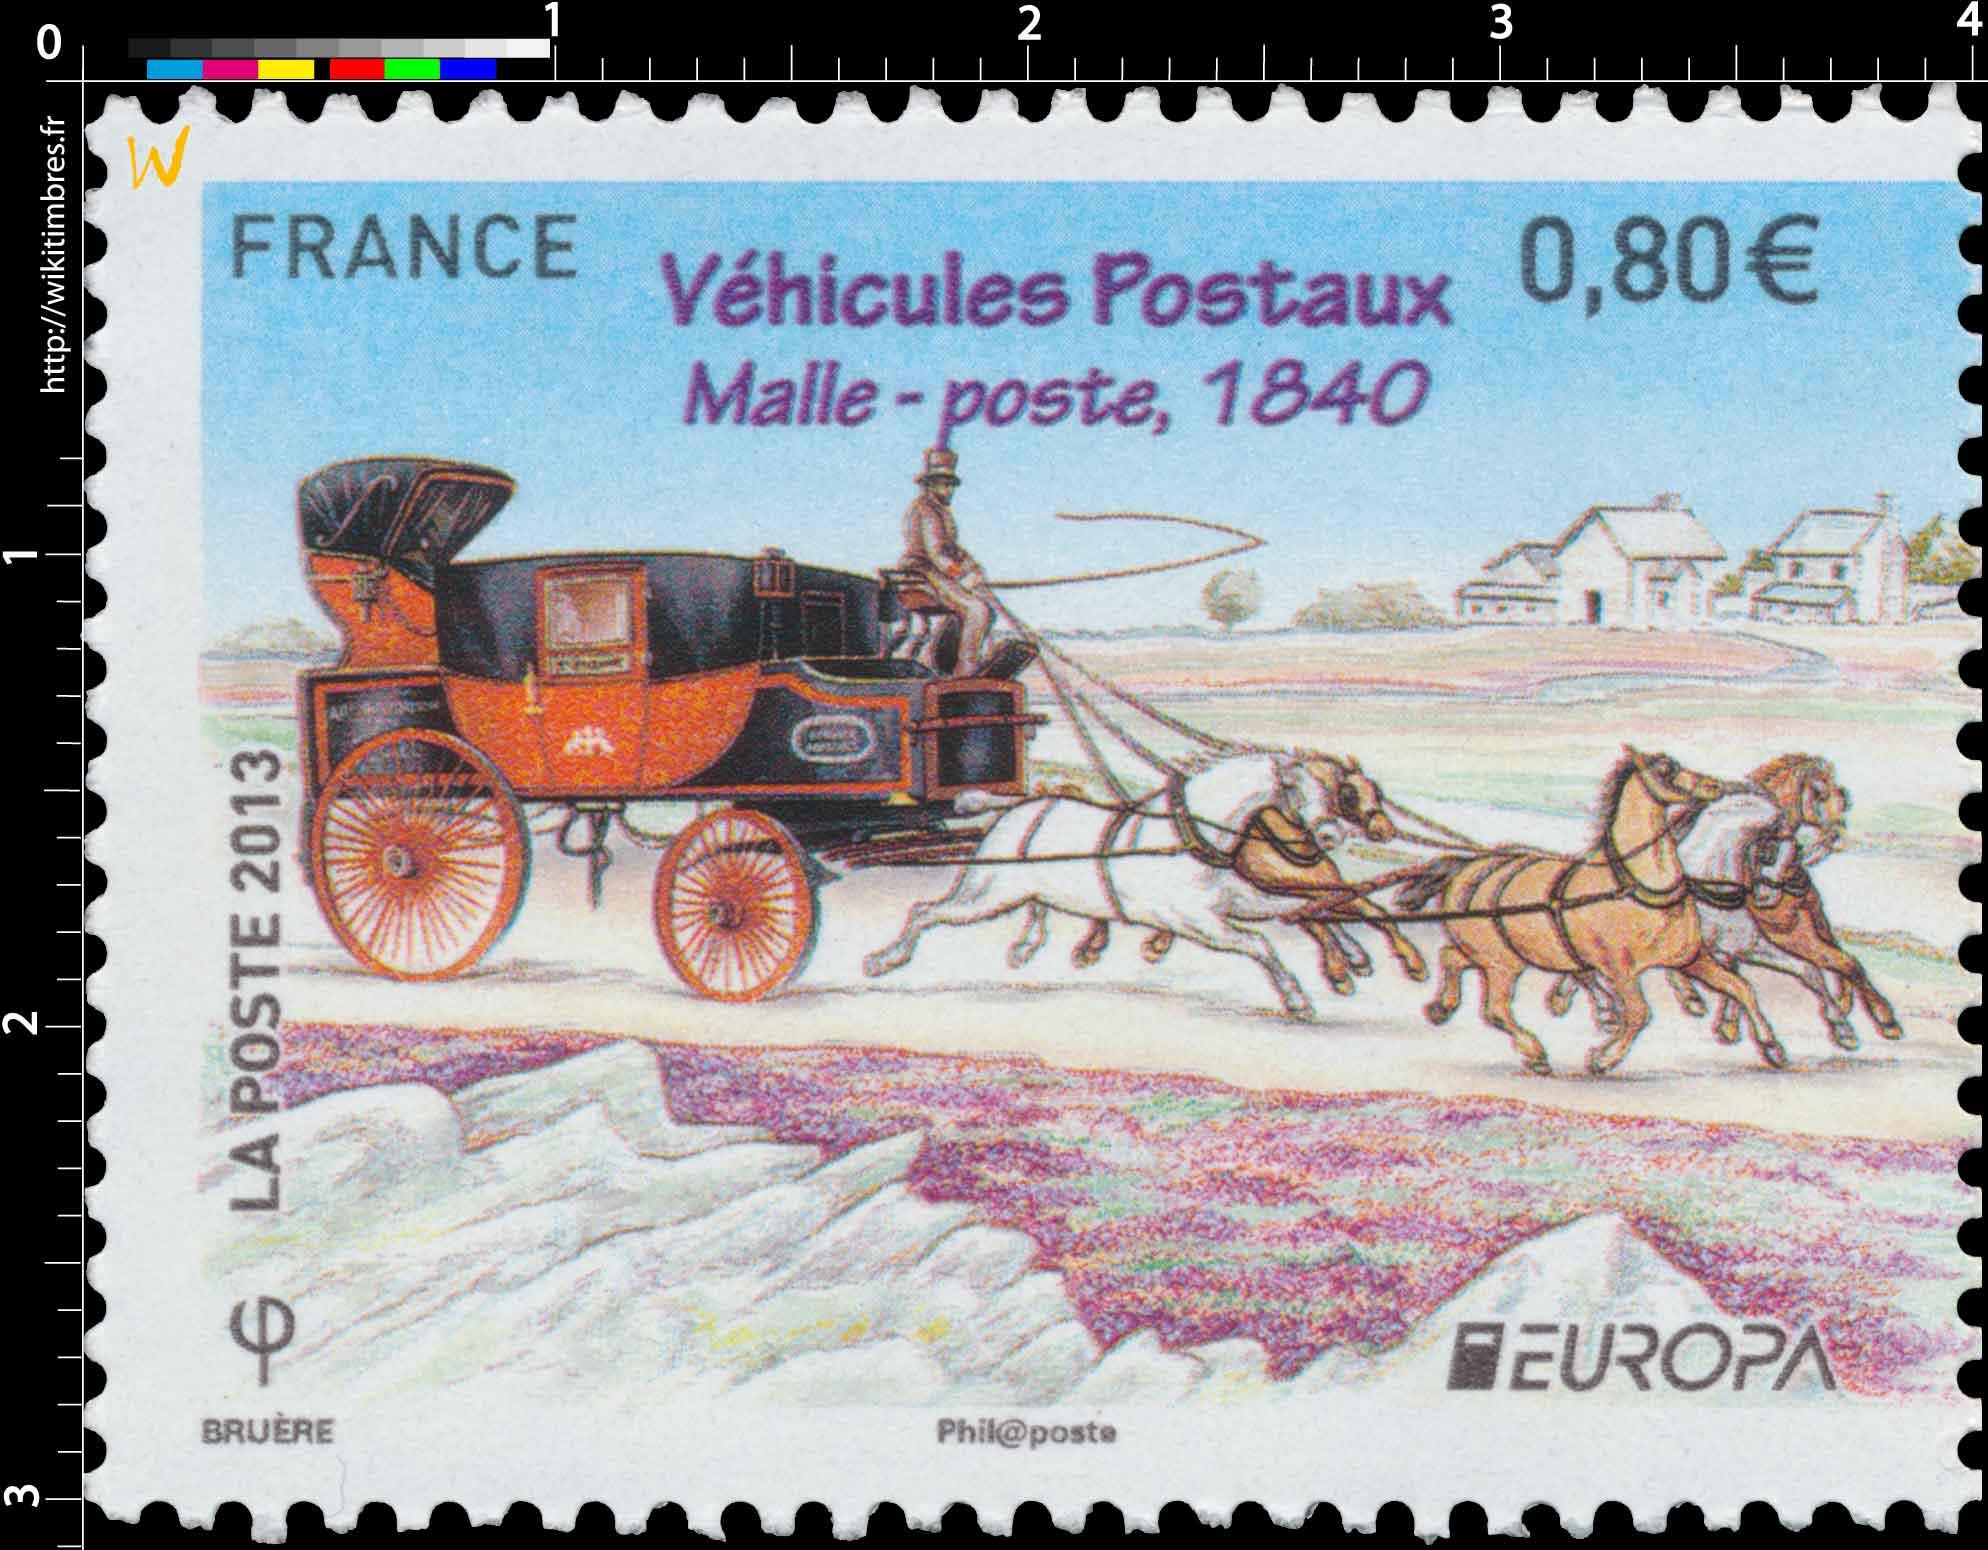 2013 Europa Véhicules Postaux Malle-poste 1840